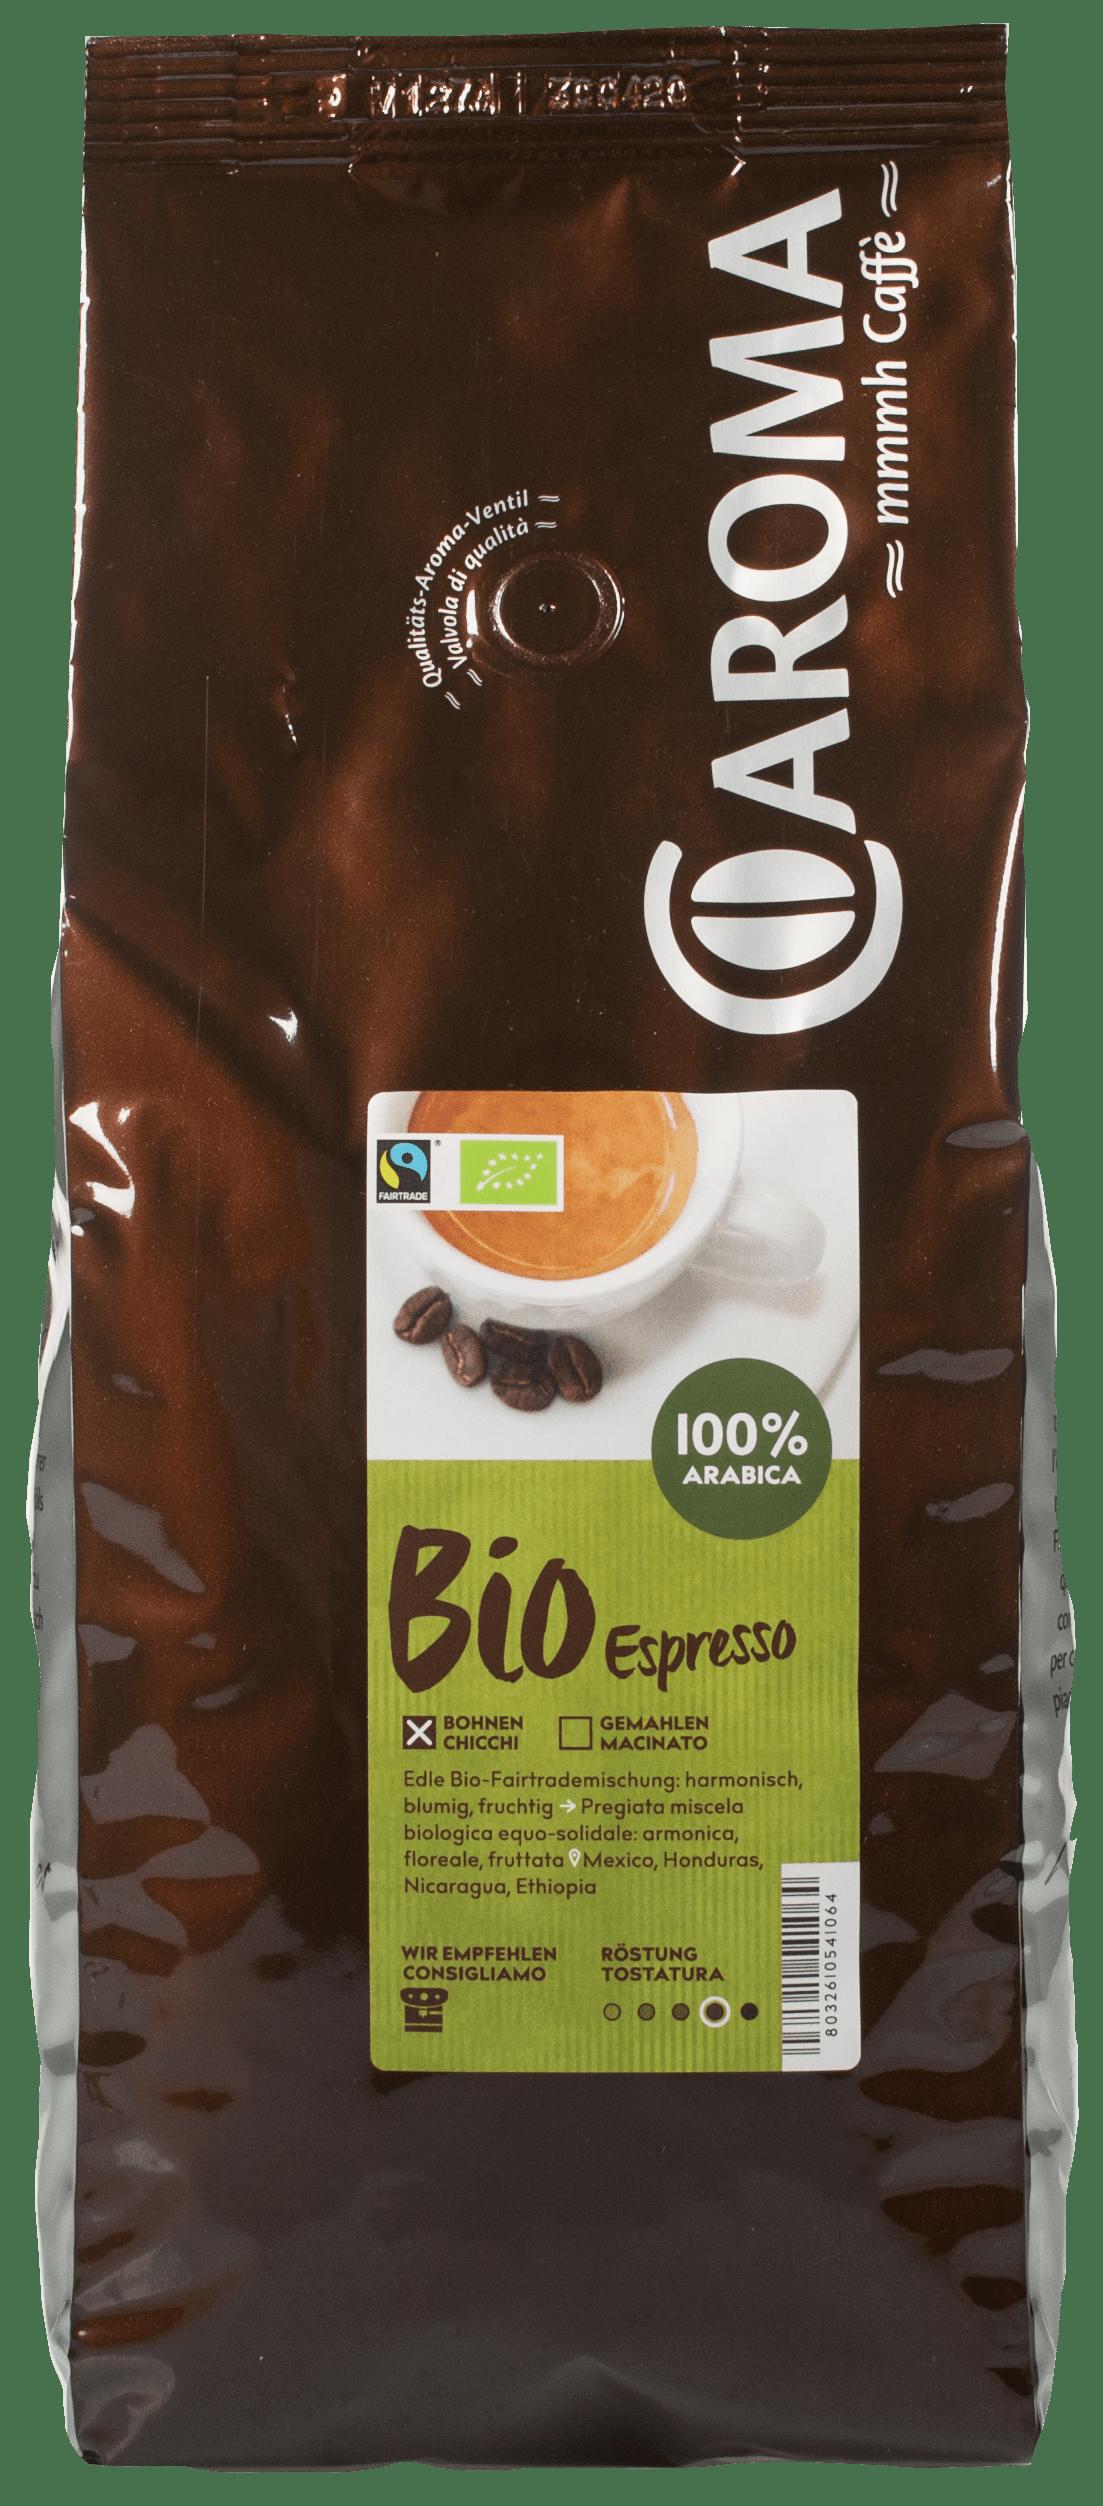 caroma caffè bio